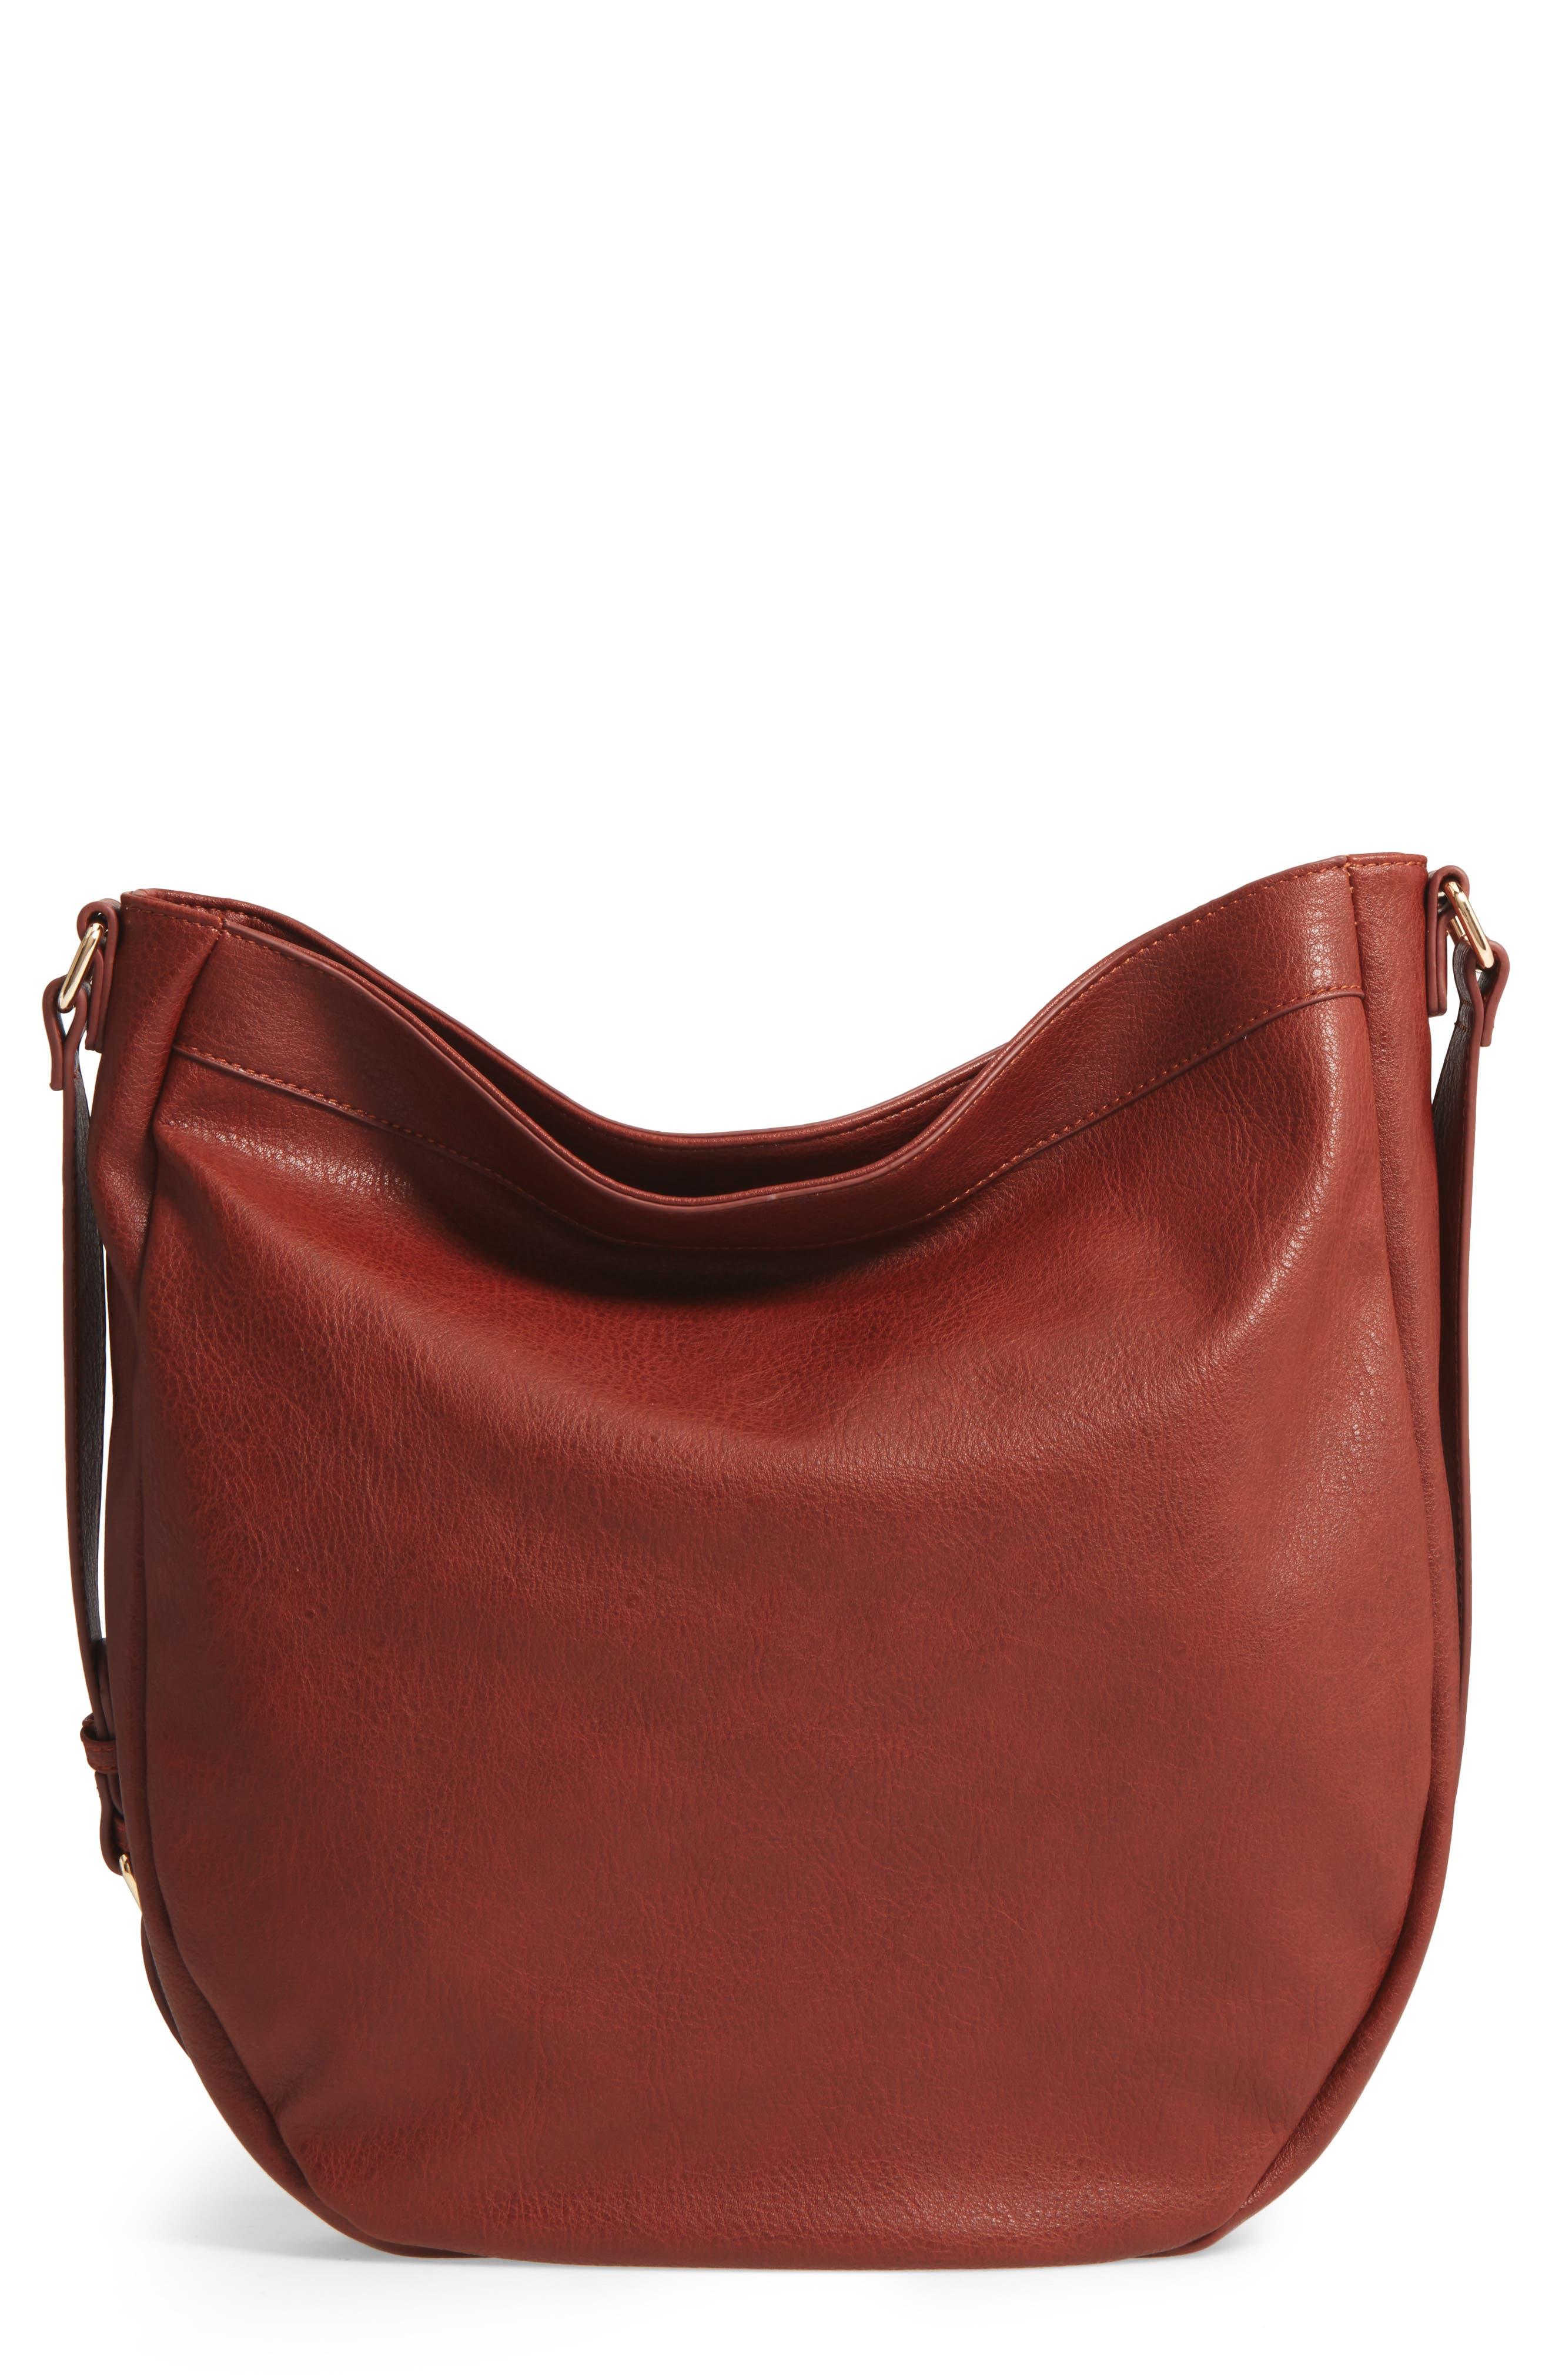 Sole Society Kadence Faux Leather Shoulder Bag